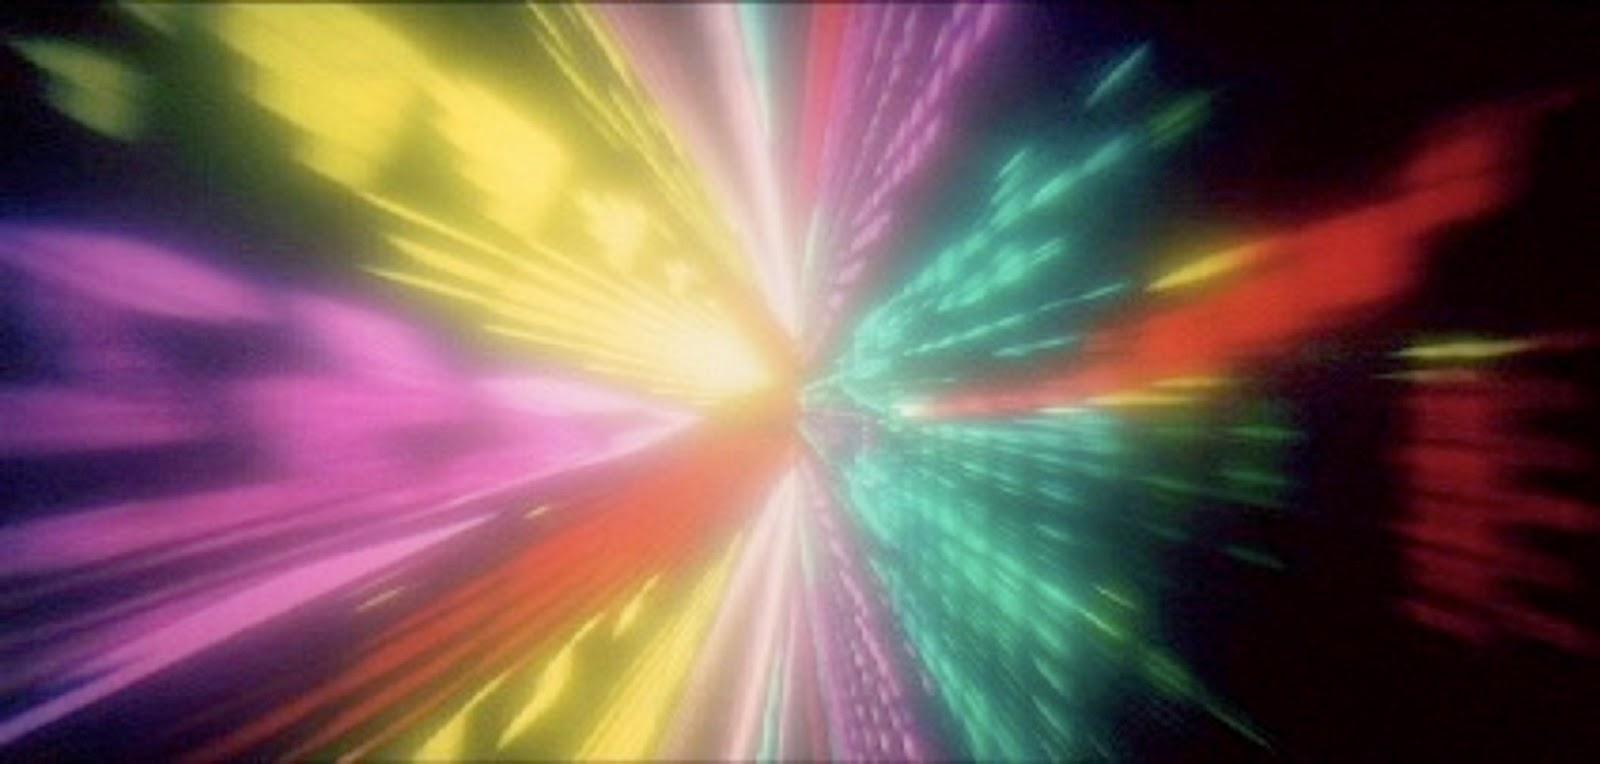 La psicodelia en el cine 2001%2BUna%2Bodisea%2Ben%2Bel%2Bespacio%2B(1968)_2001%2Ba%2Bspace%2Bodyssey